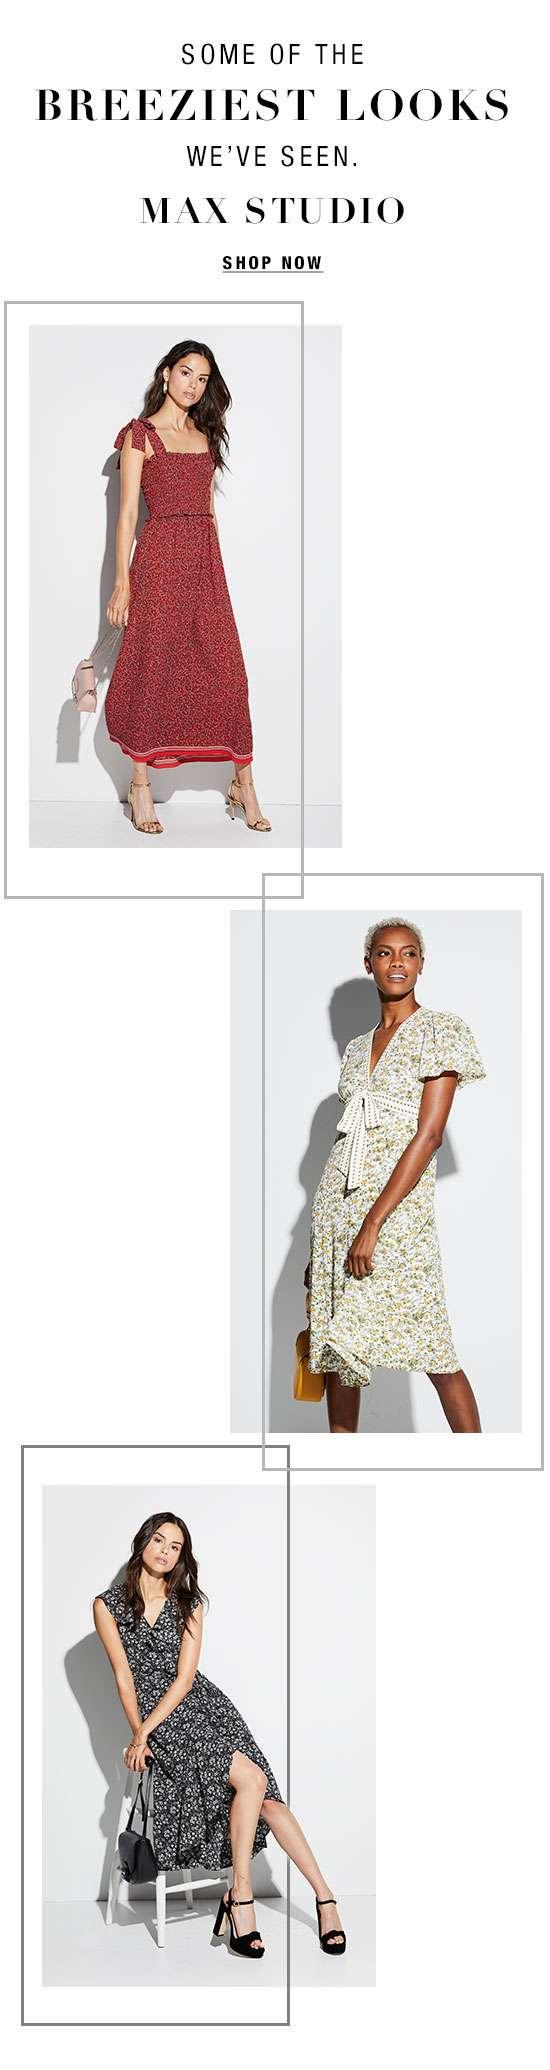 Summer dresses from Max Studio